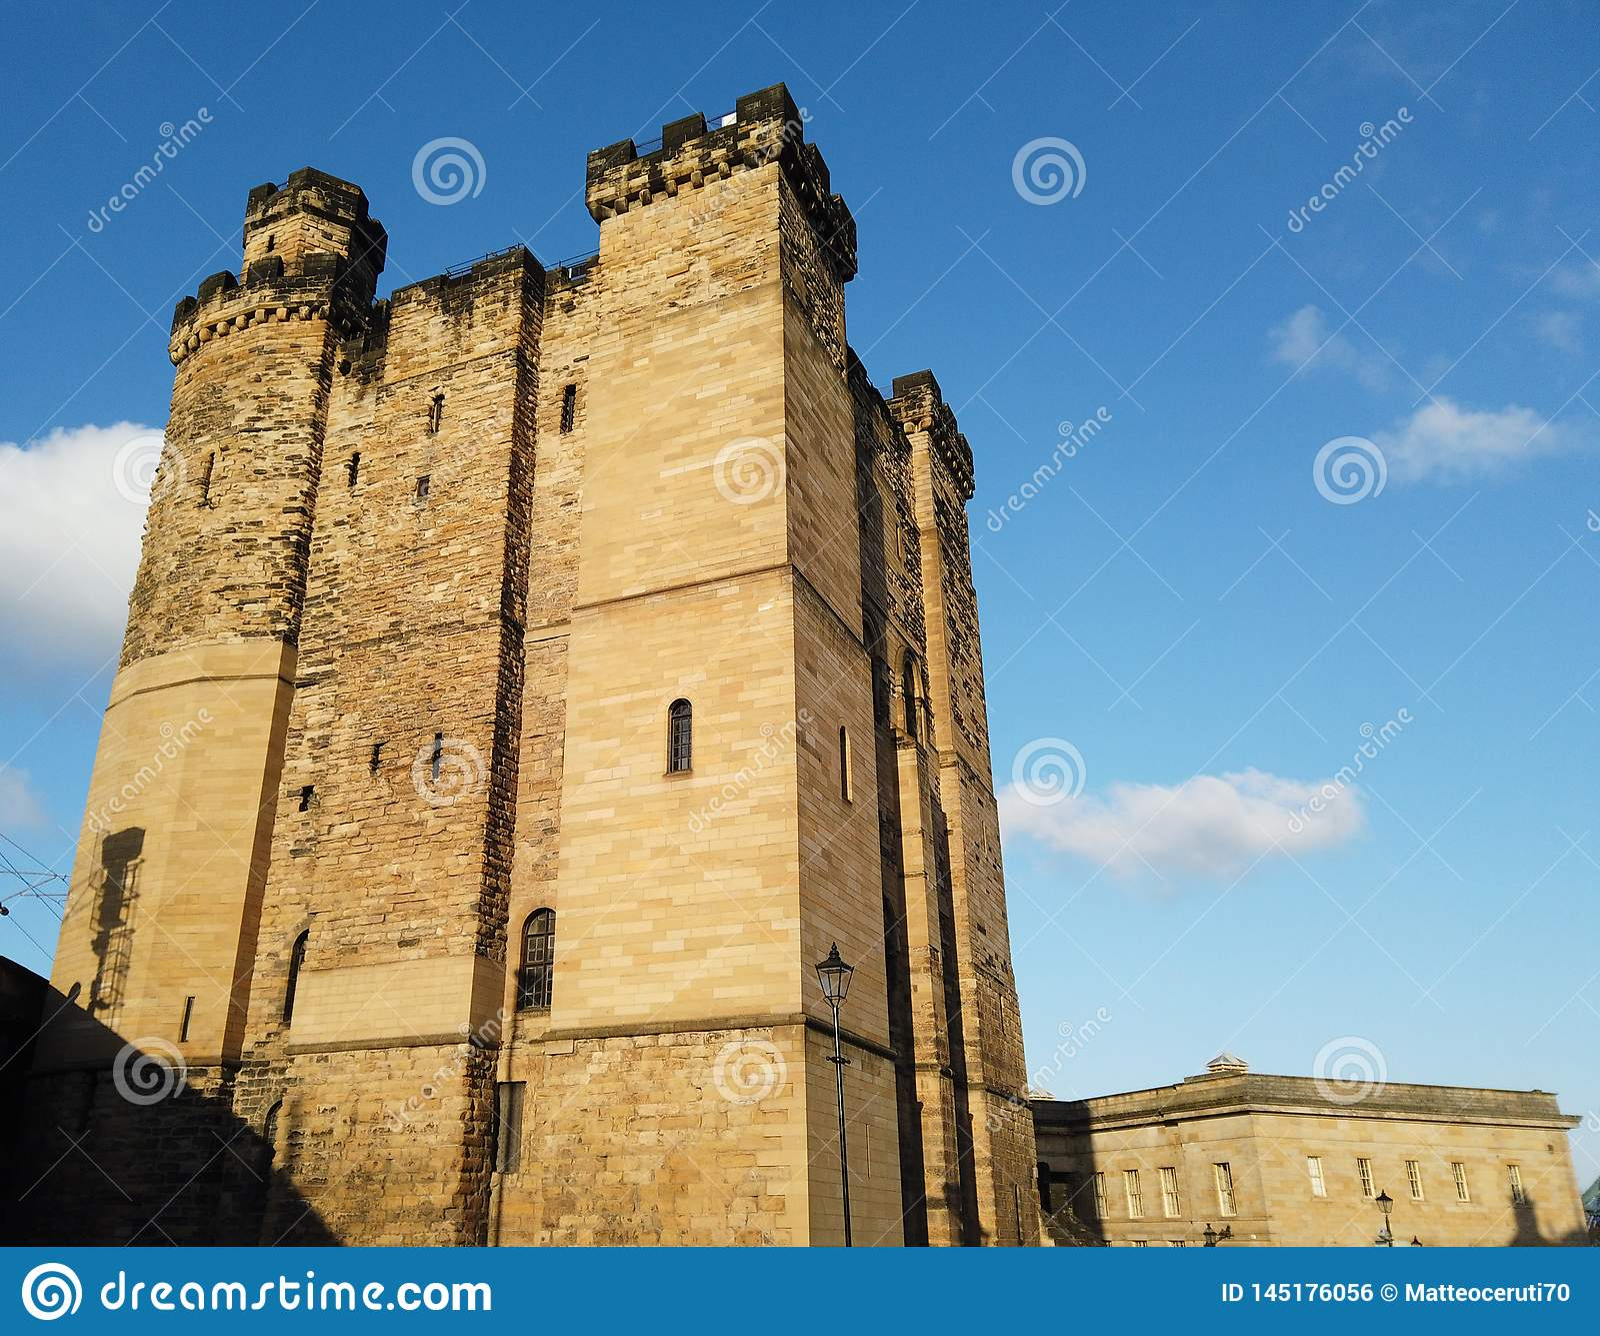 Newcastle Upon Tyne, England, United Kingdom. The Exterior ...